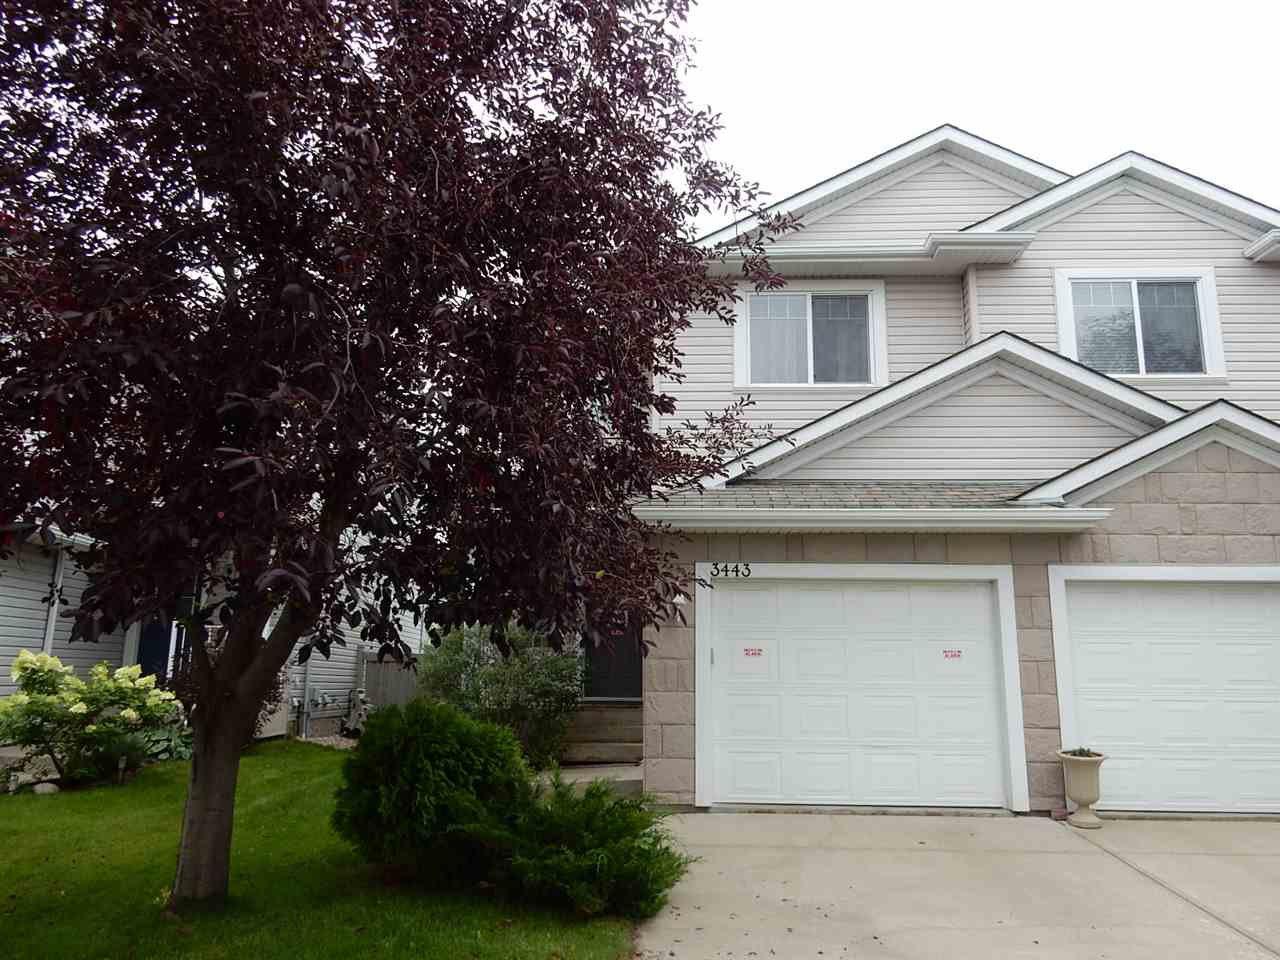 Main Photo: 3443 McKay Lane in Edmonton: Zone 55 House Half Duplex for sale : MLS®# E4173243